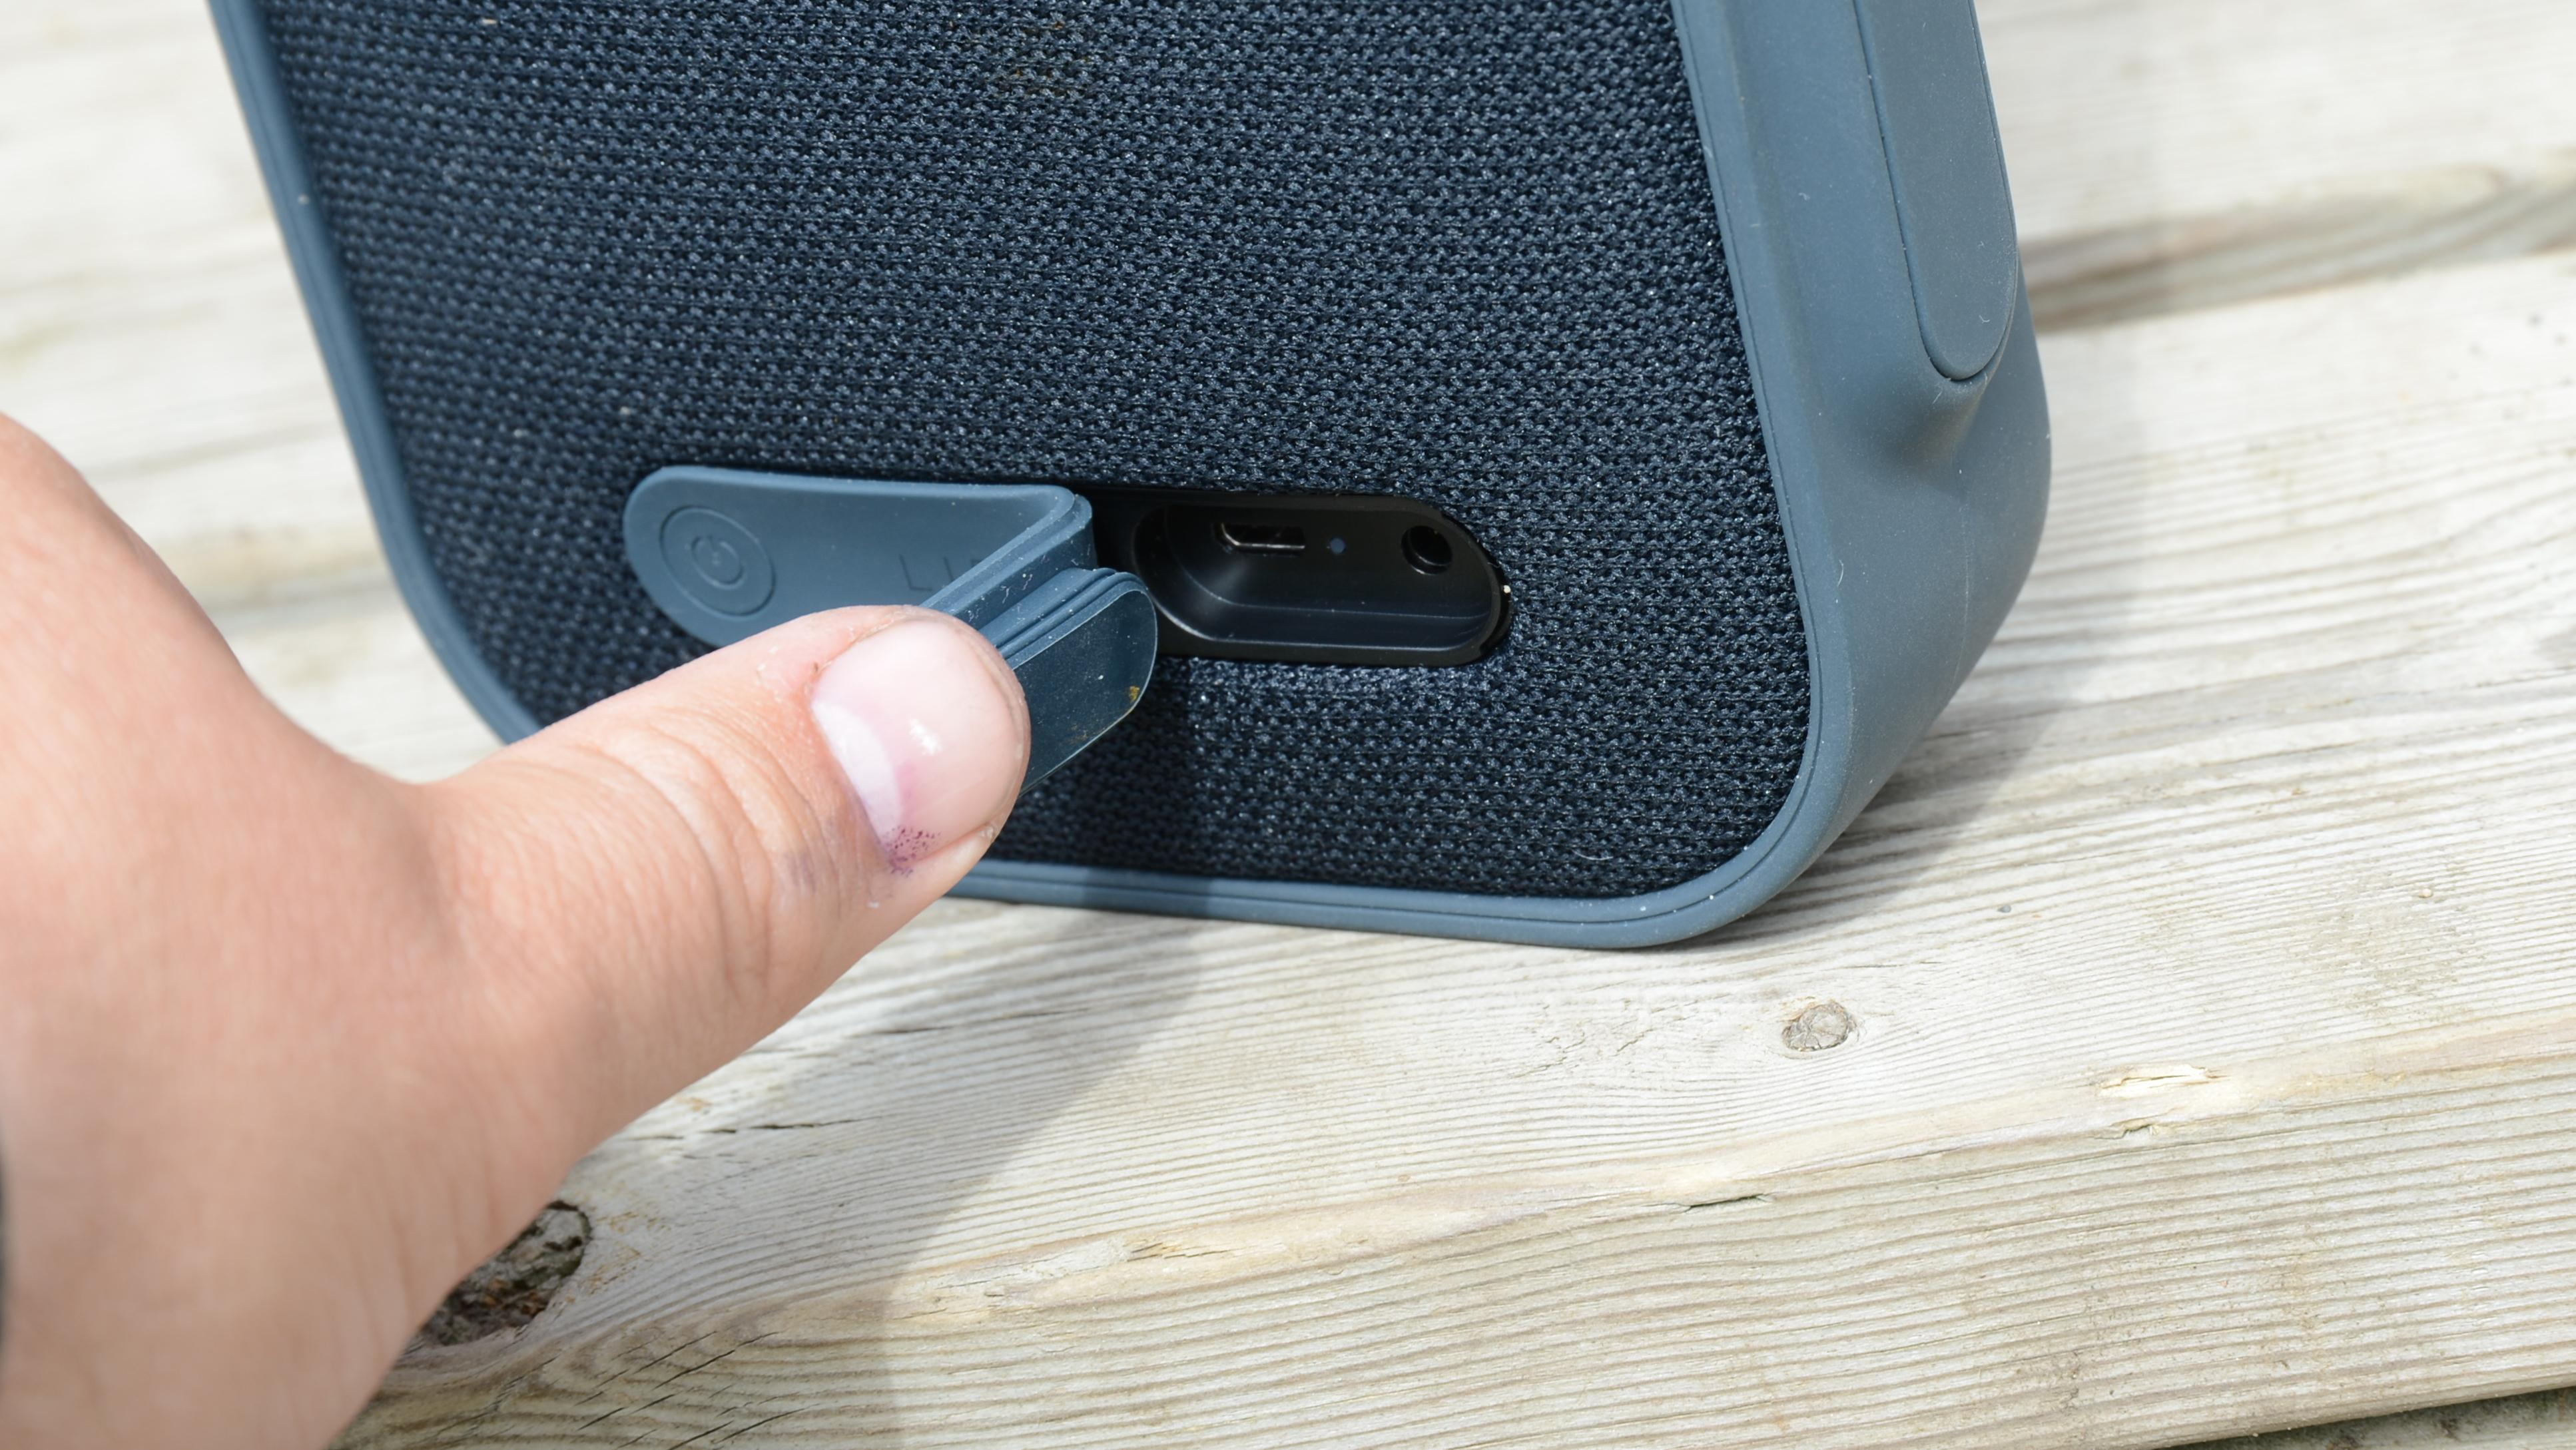 Libratone One Click har en helt vanlig USB-inngang som du lader den med.